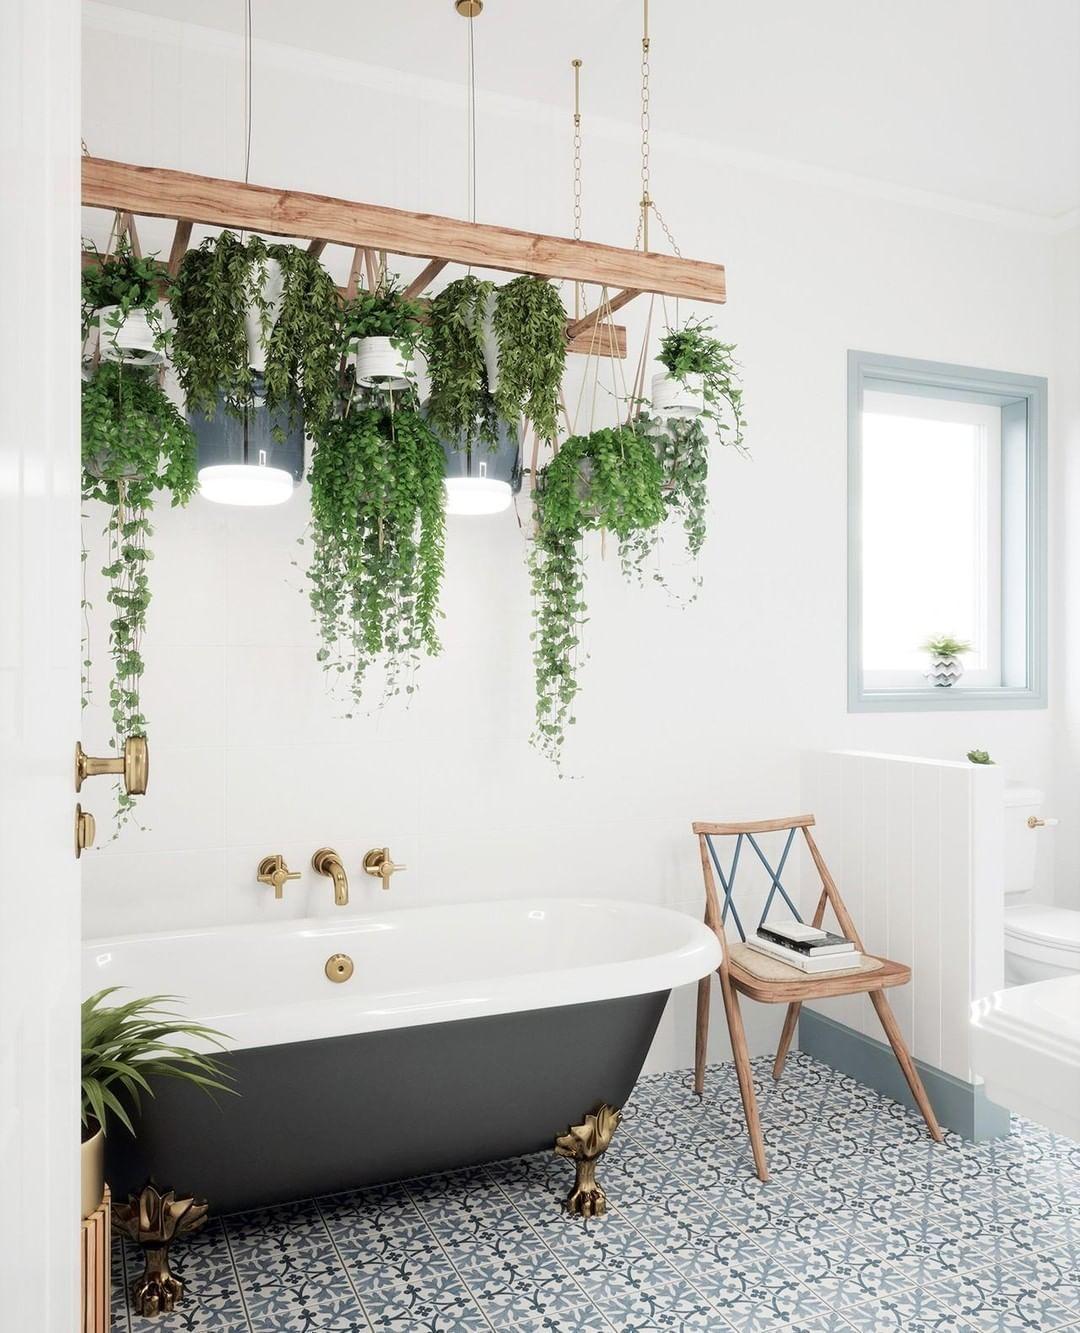 Bathtub Hanging Plants Indoor Bathroom Plants Plant Decor Plant decor for bathroom